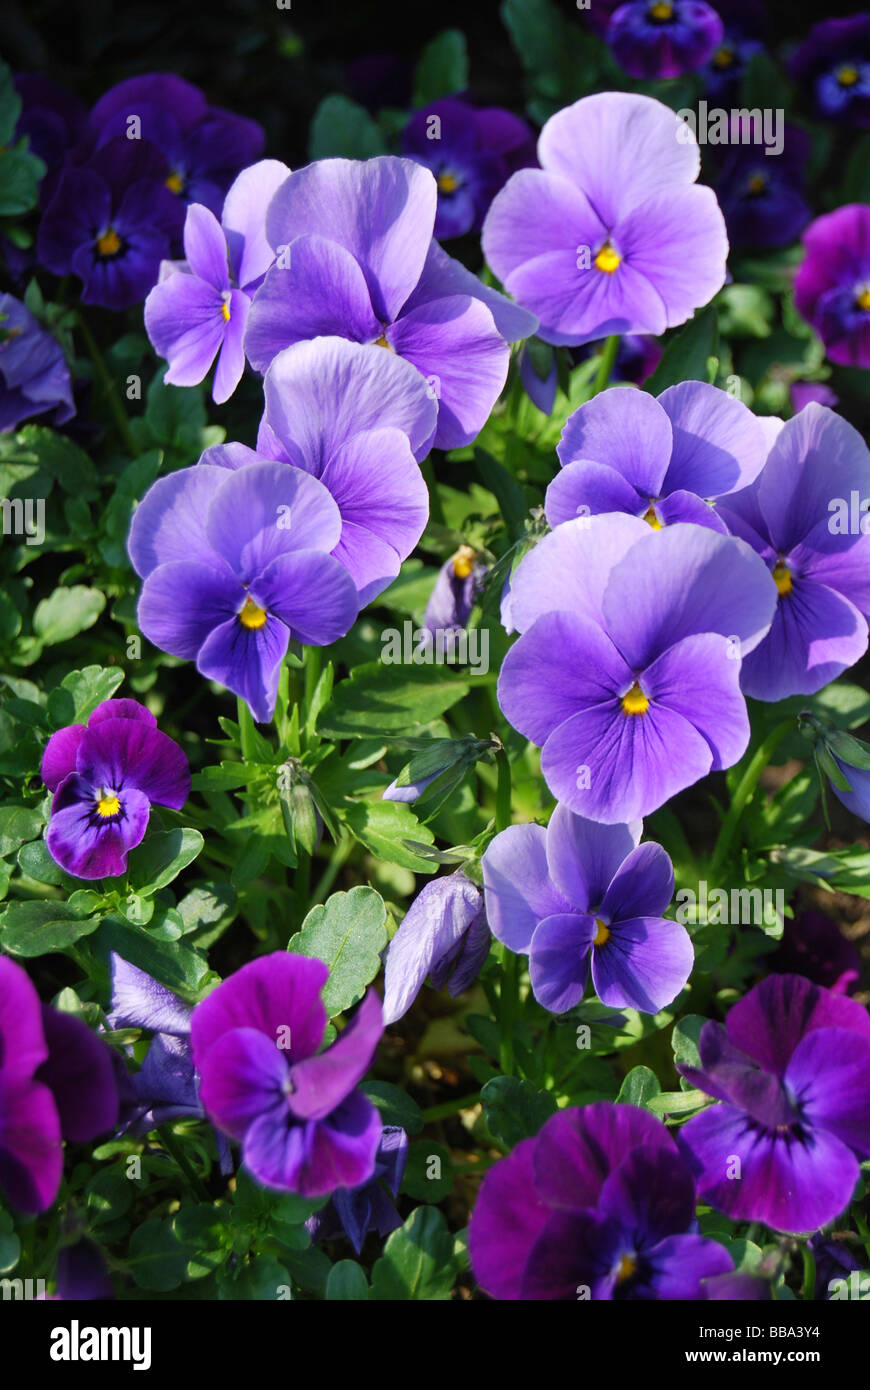 Pansies (Viola), purple - Stock Image